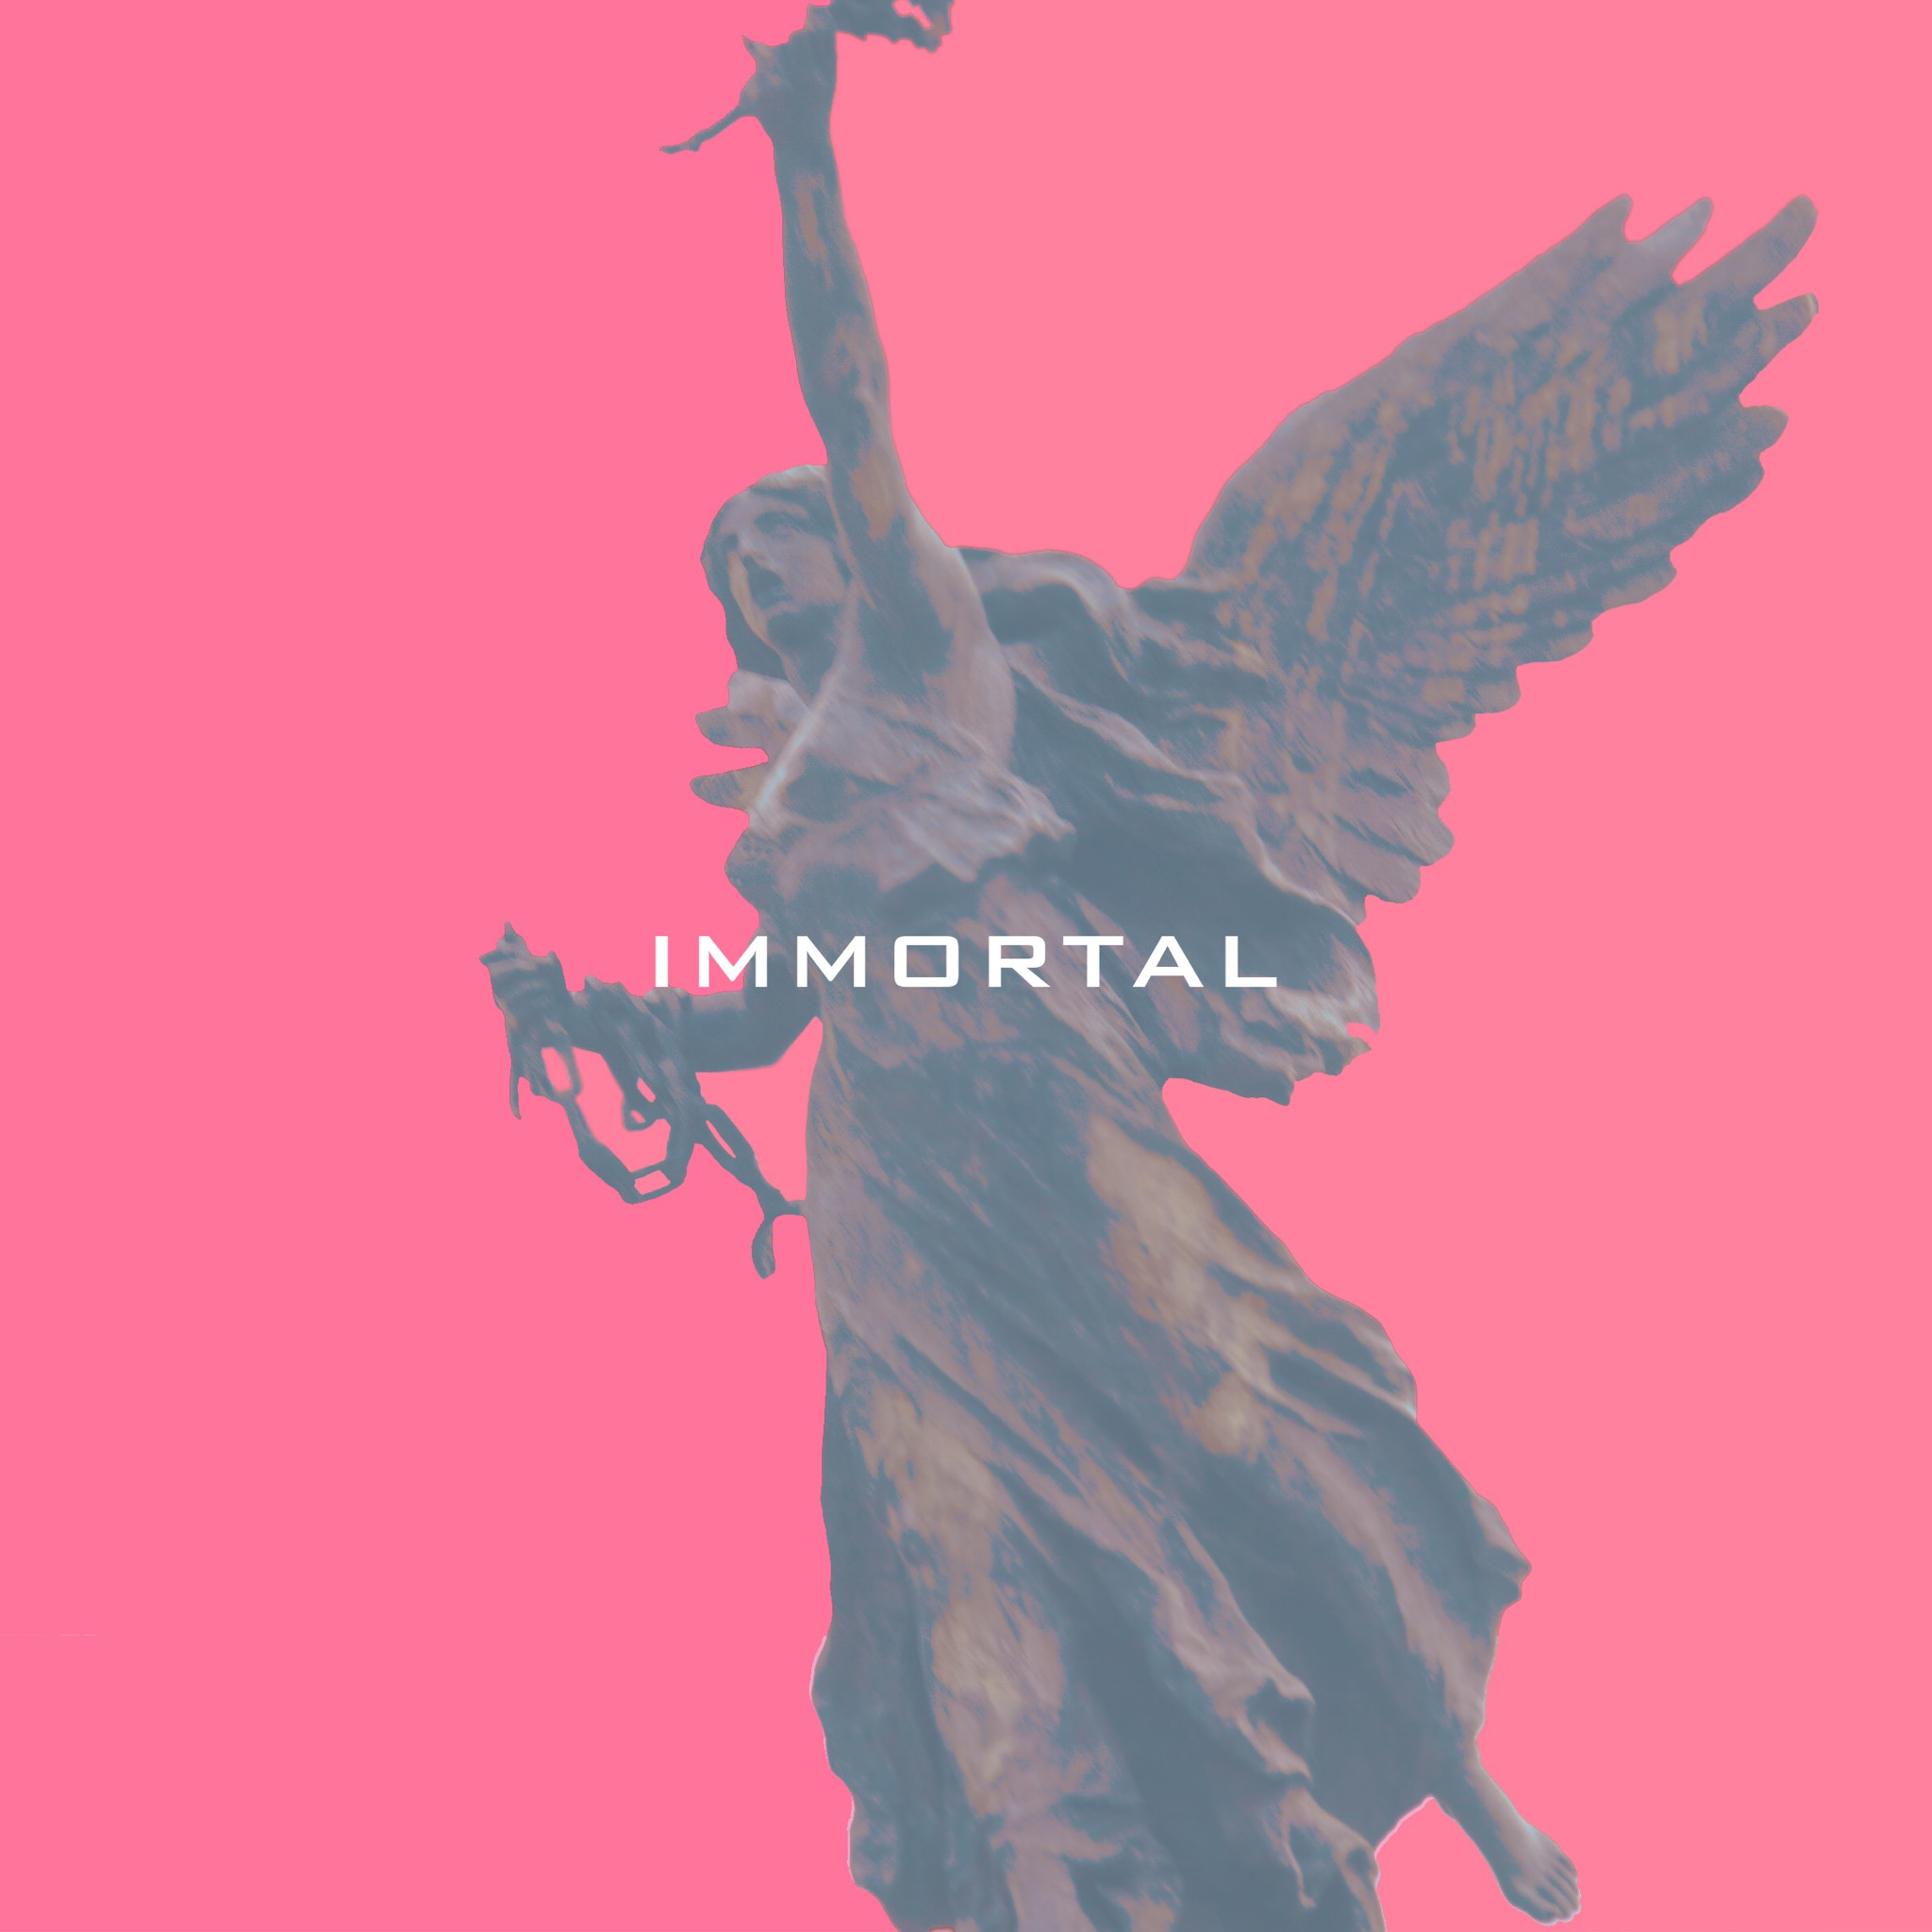 Immortal1.jpg